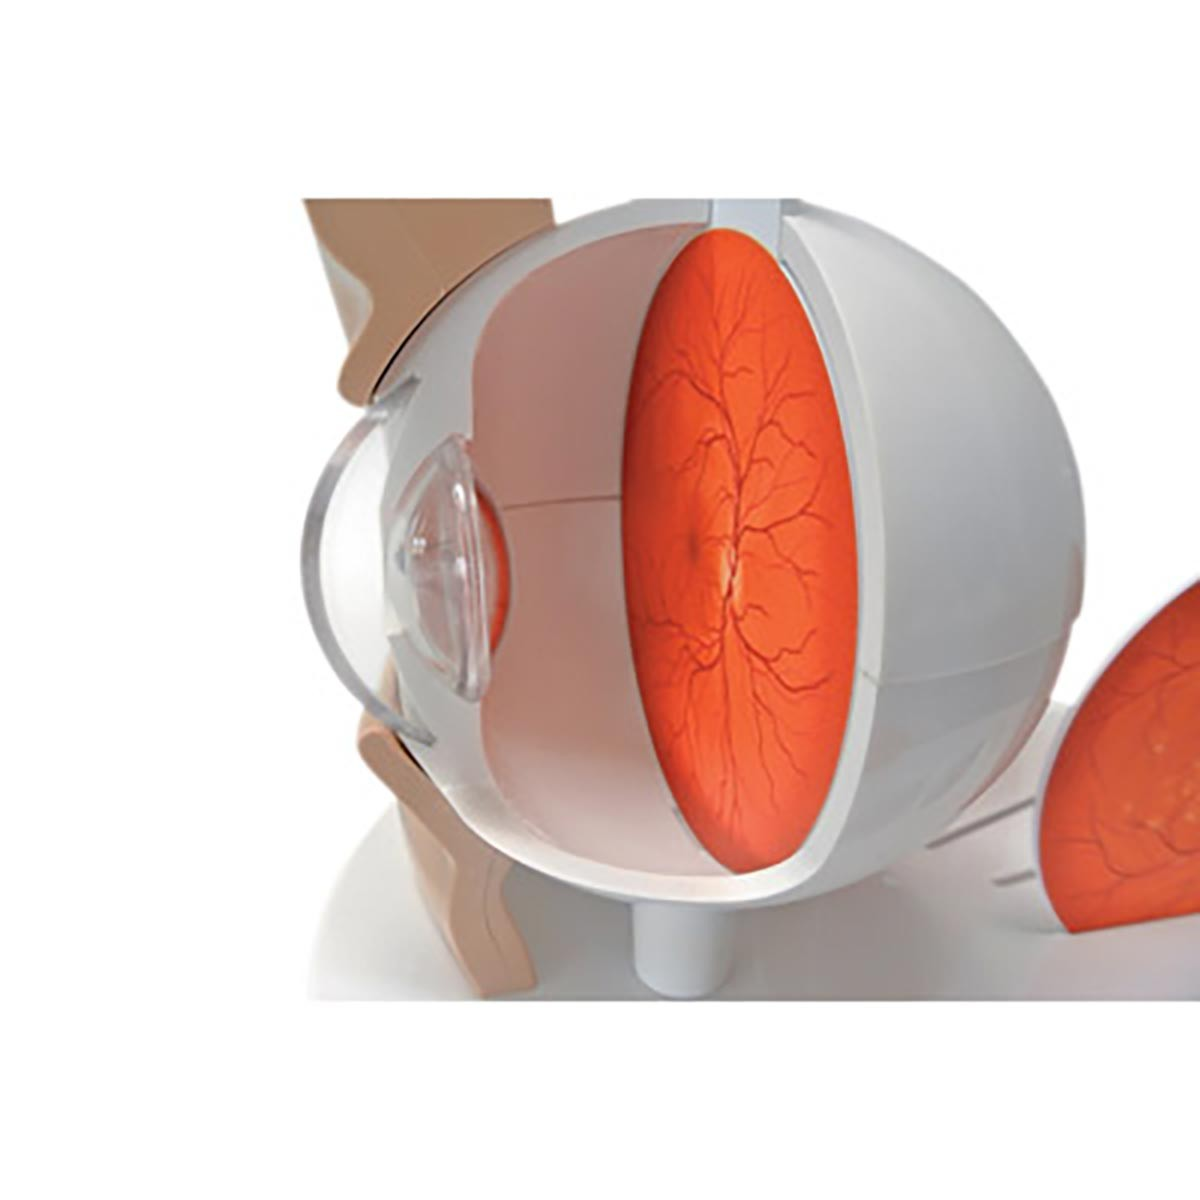 Pathologisches Auge